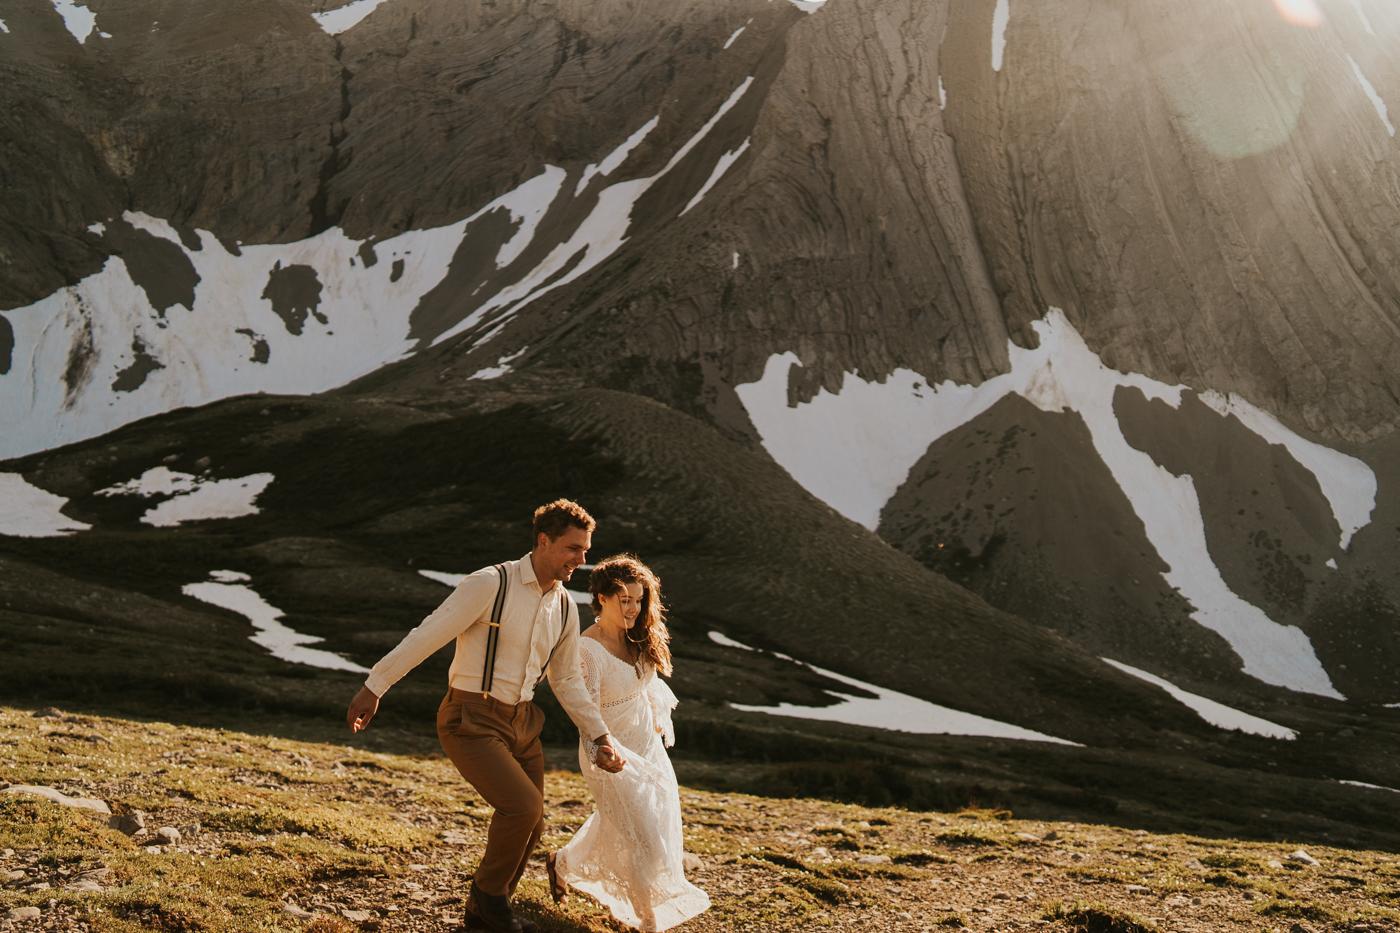 tyraephotography_photographer_wedding_elopement_engagement_photography-08412.jpg